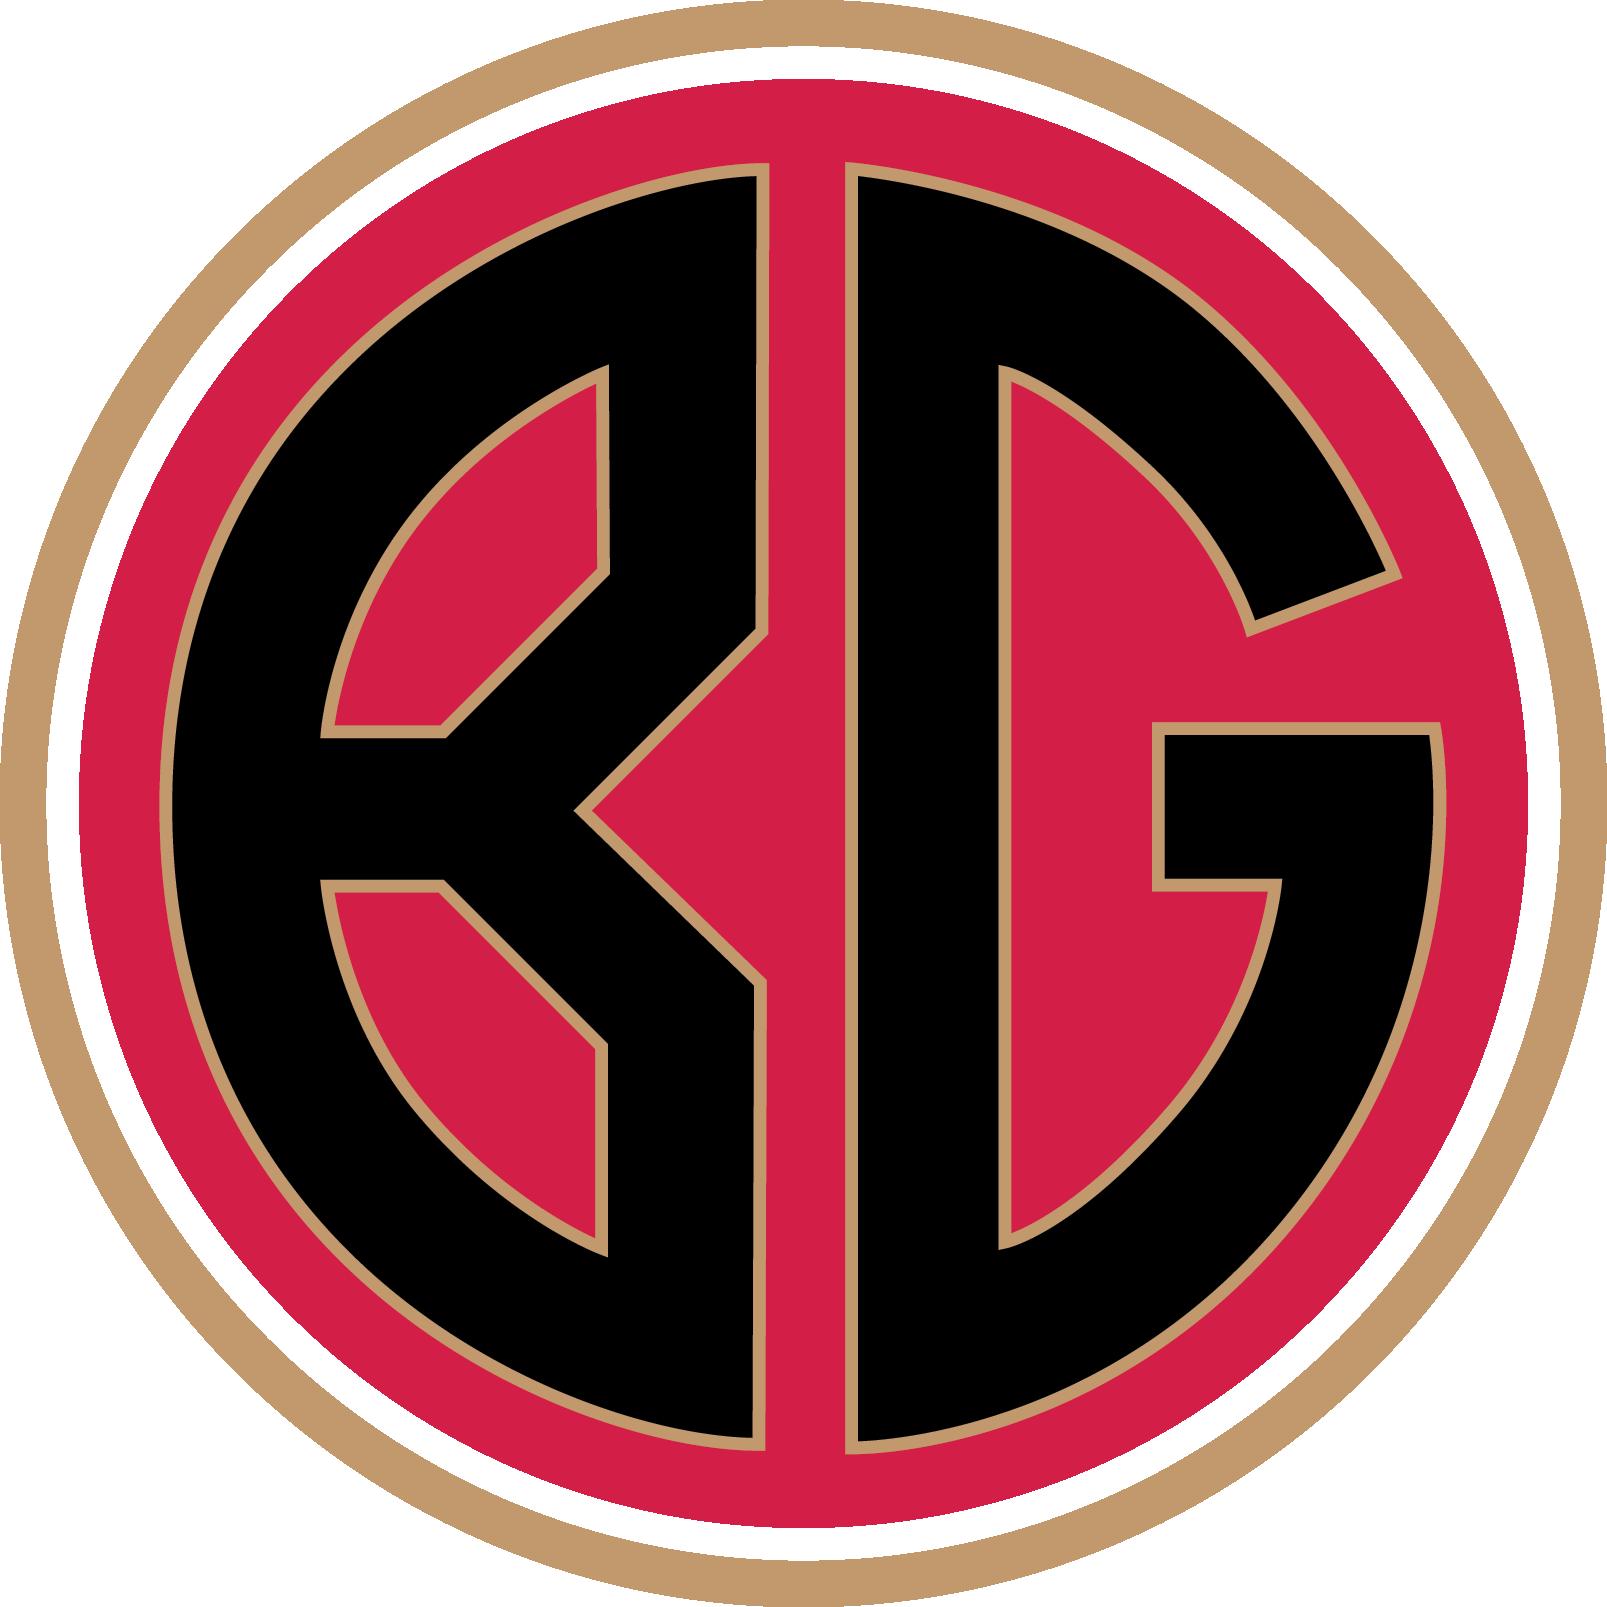 BG Logo_color vectorial_png.png